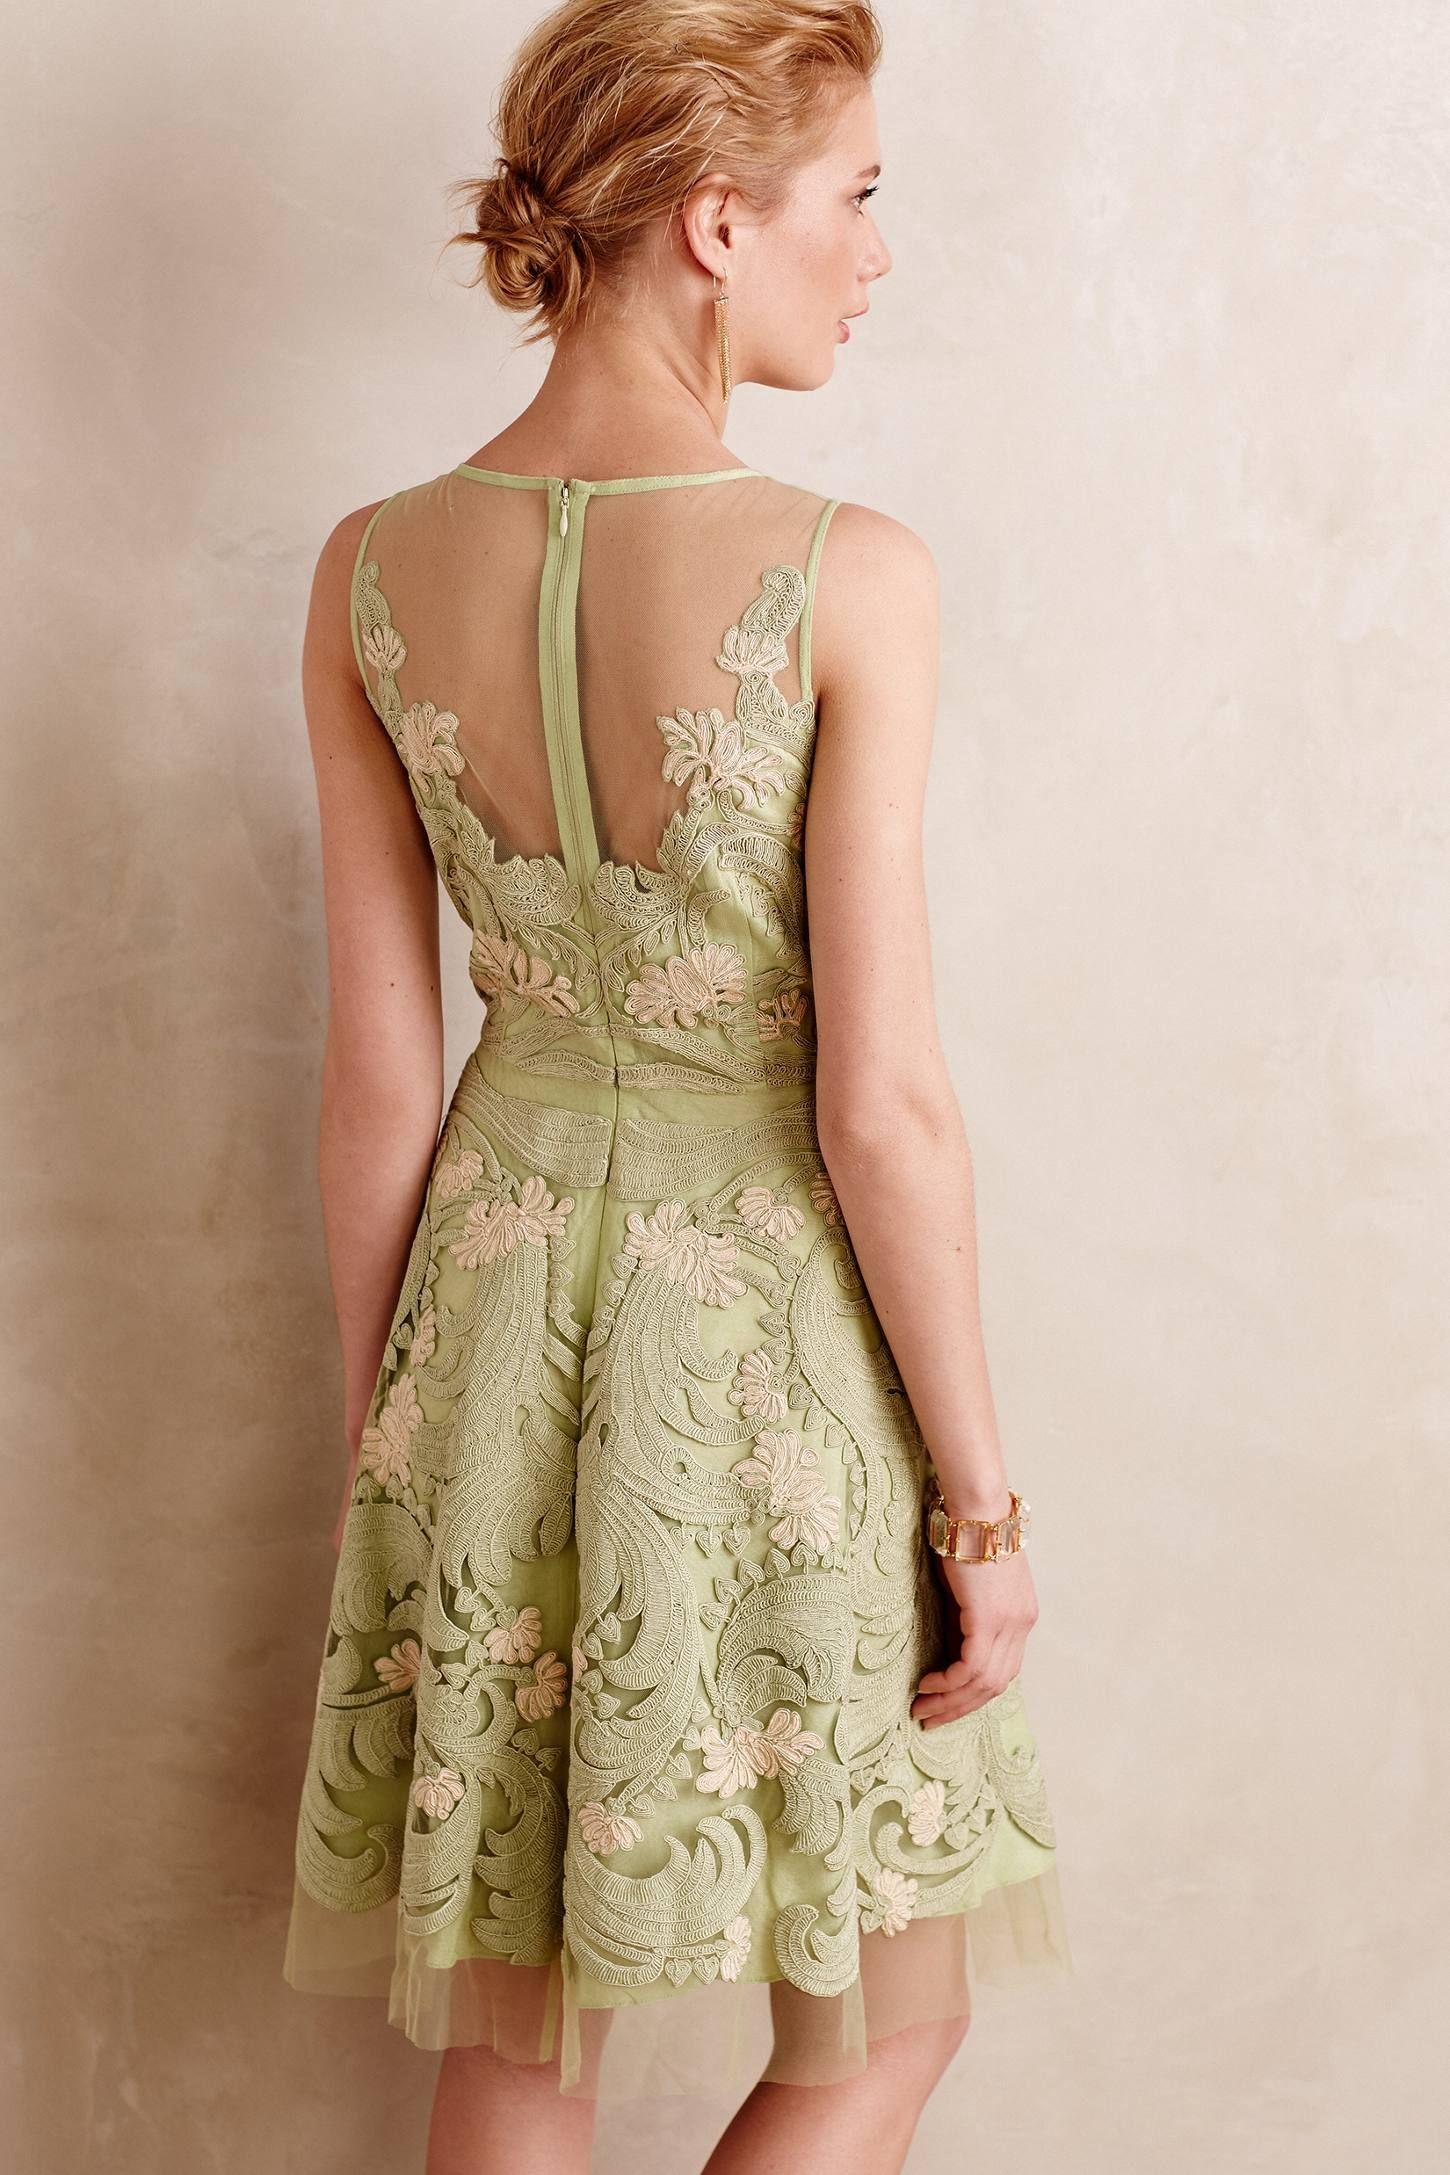 NEW Anthropologie Embroidered Panna Dress by Pankaj & Nidhi Size 8